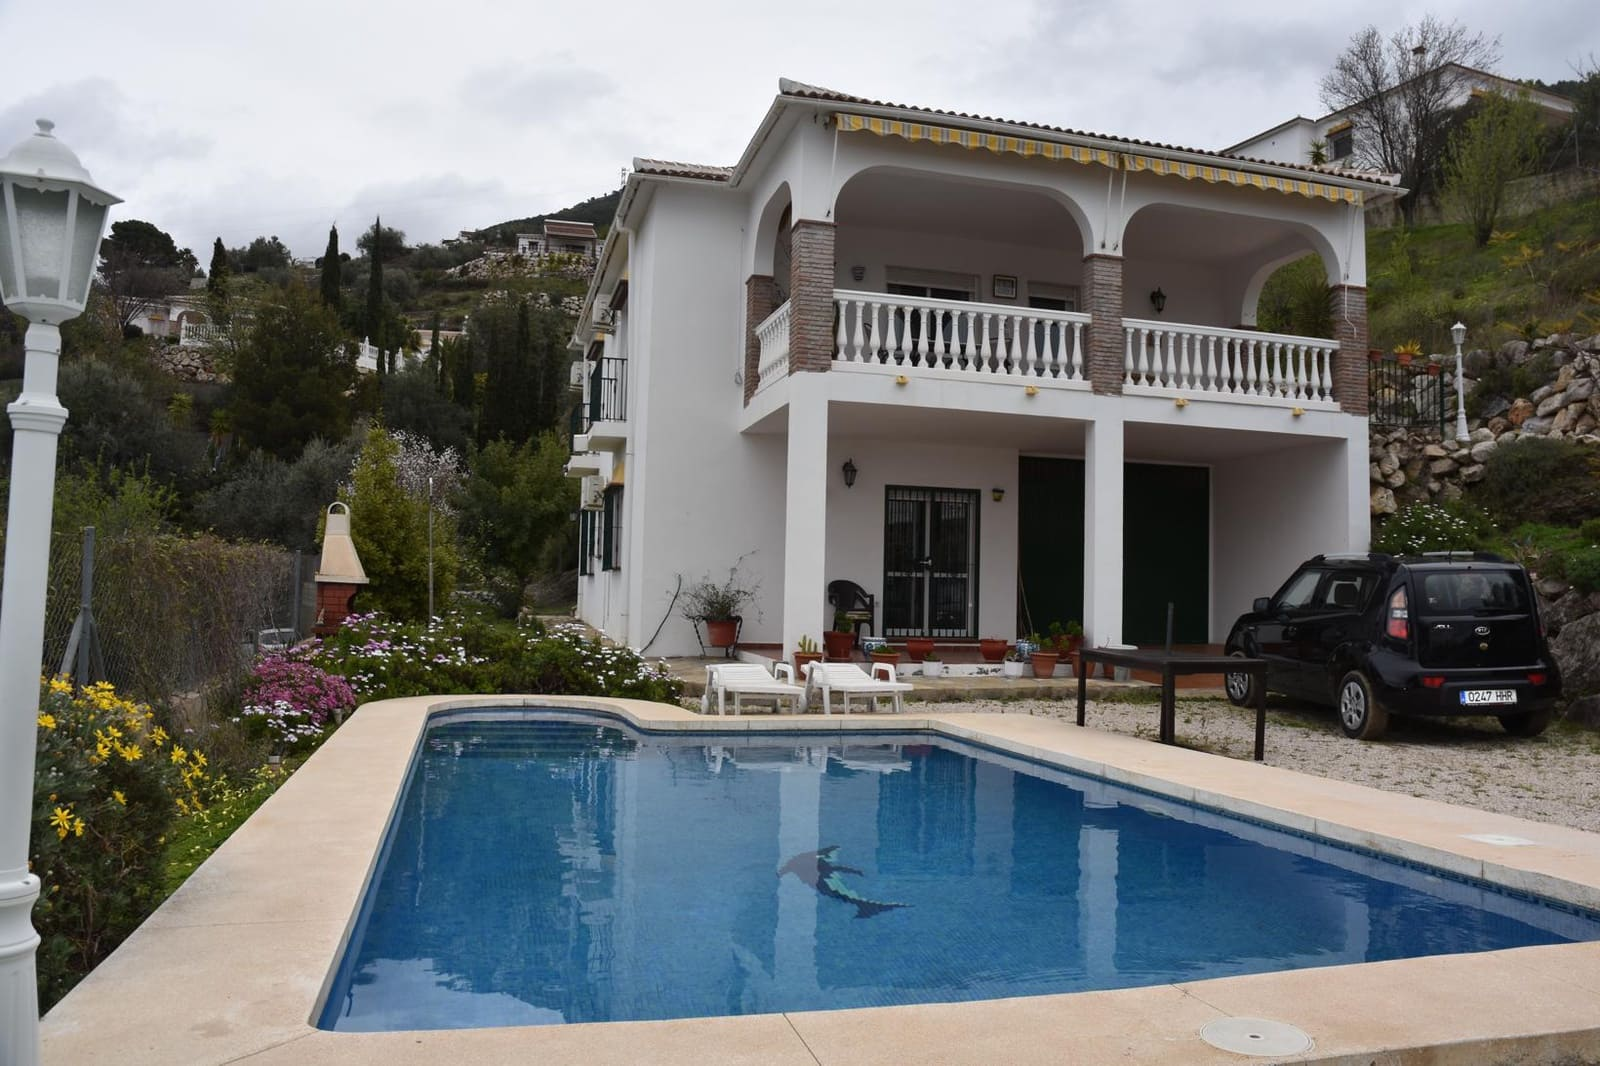 3 bedroom Villa for sale in Alcaucin with pool - € 275,000 (Ref: 4365516)